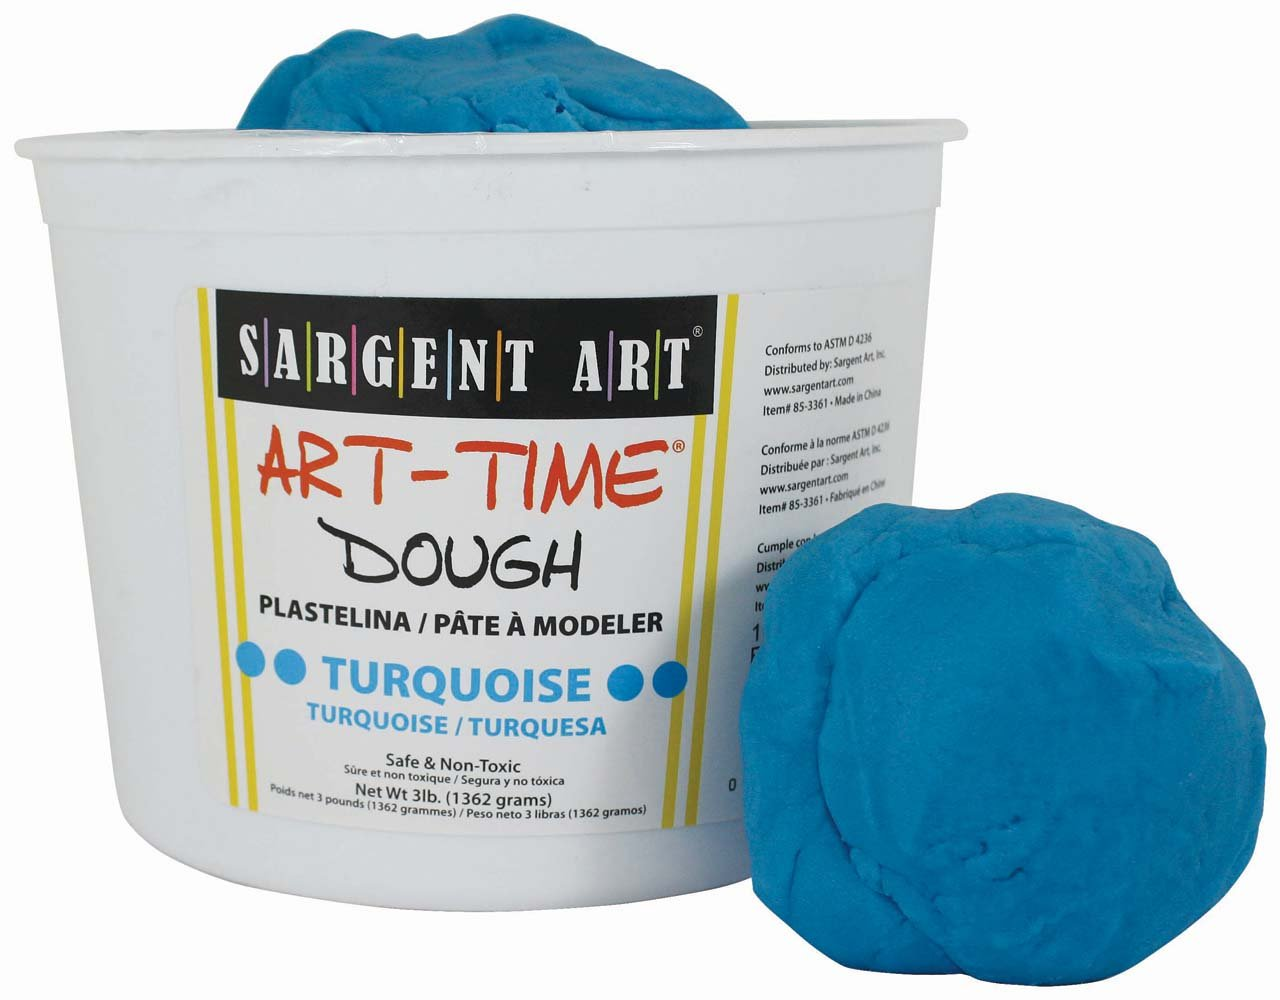 Sargent Art 85-3361 3-Pound Art-Time Dough, Turquoise